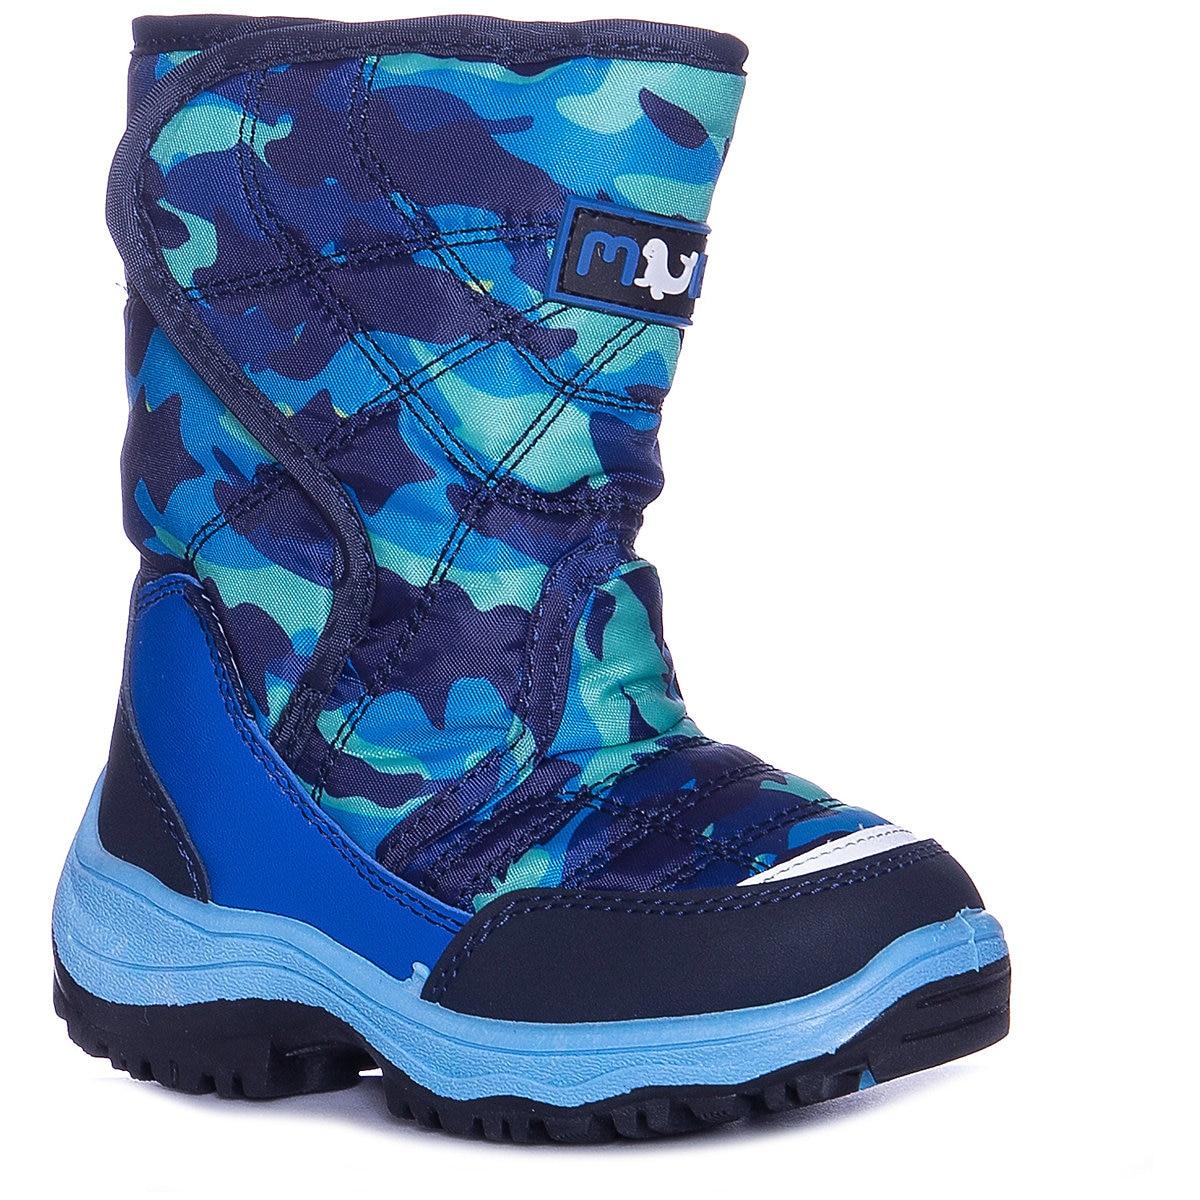 MURSU Boots 8739234 Winter Boys Wool children shoes boy MTpromo reima boots 8624989 for boys winter boy children shoes